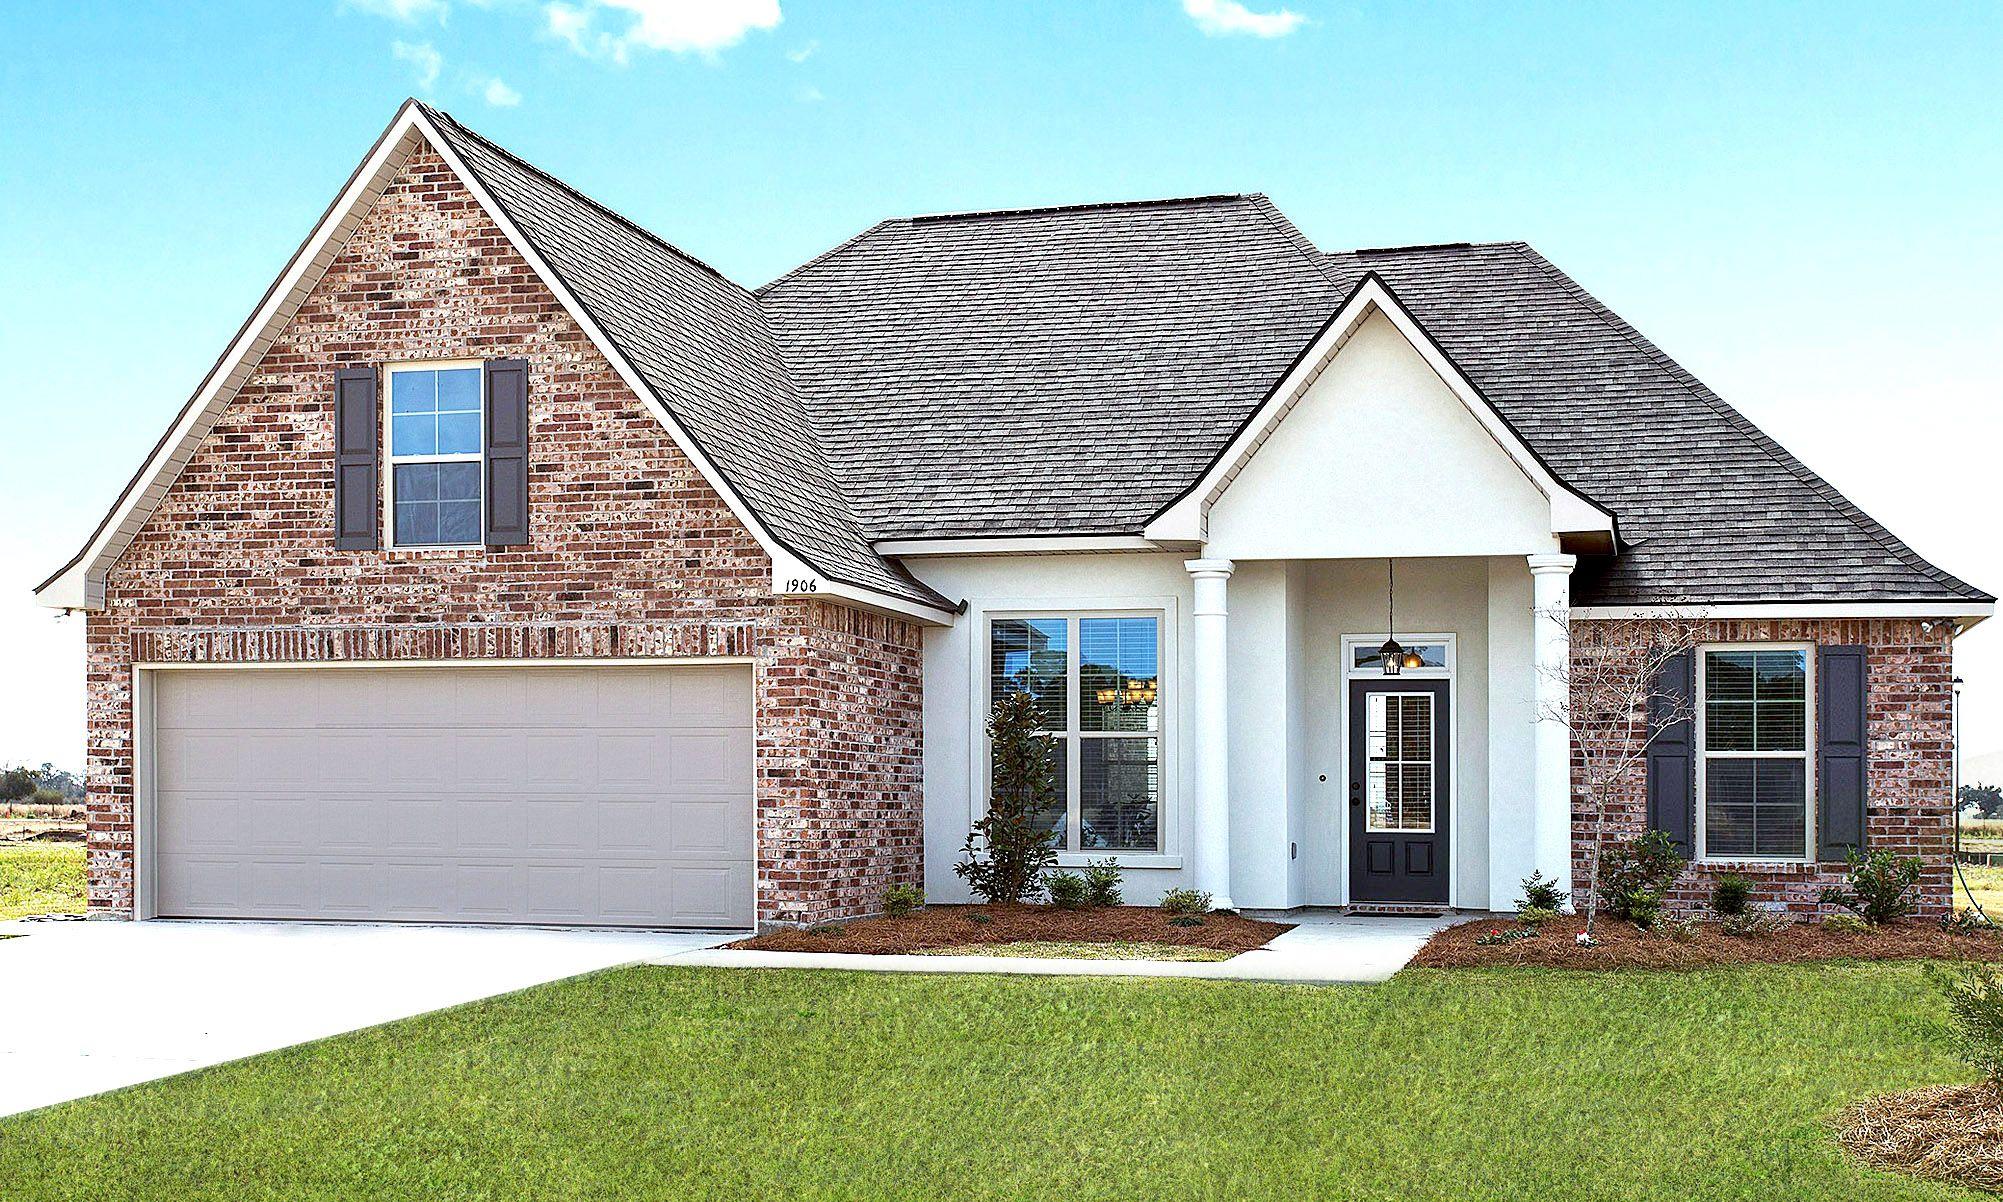 Beau Blanc Estates Model Home Rose Iii B Floor Plan In 2020 Model Homes Home Builders New Home Communities